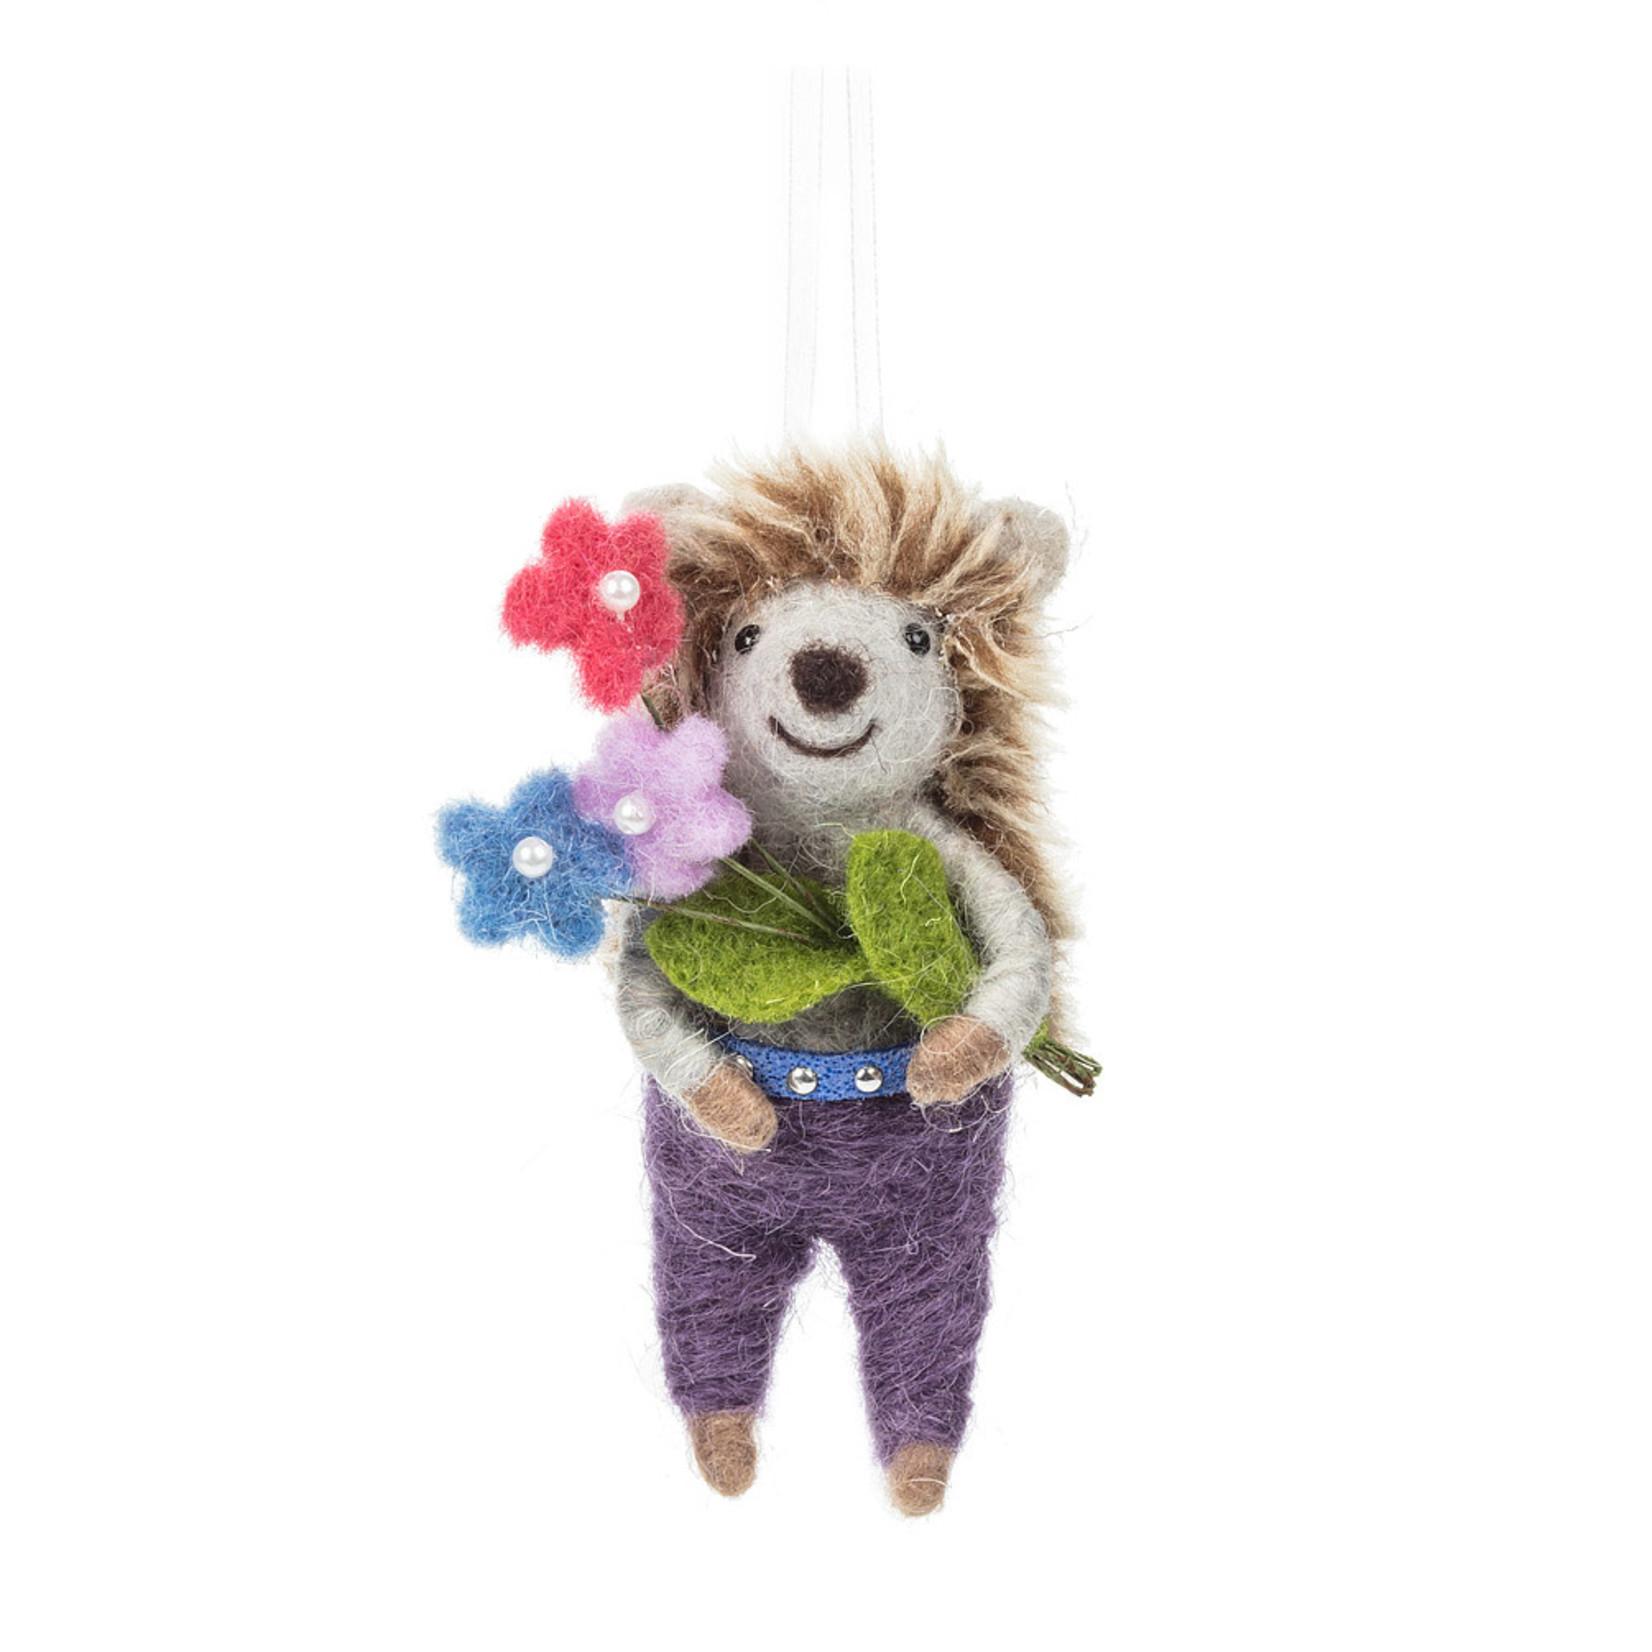 Hedgehog Holding Flower Bouquet